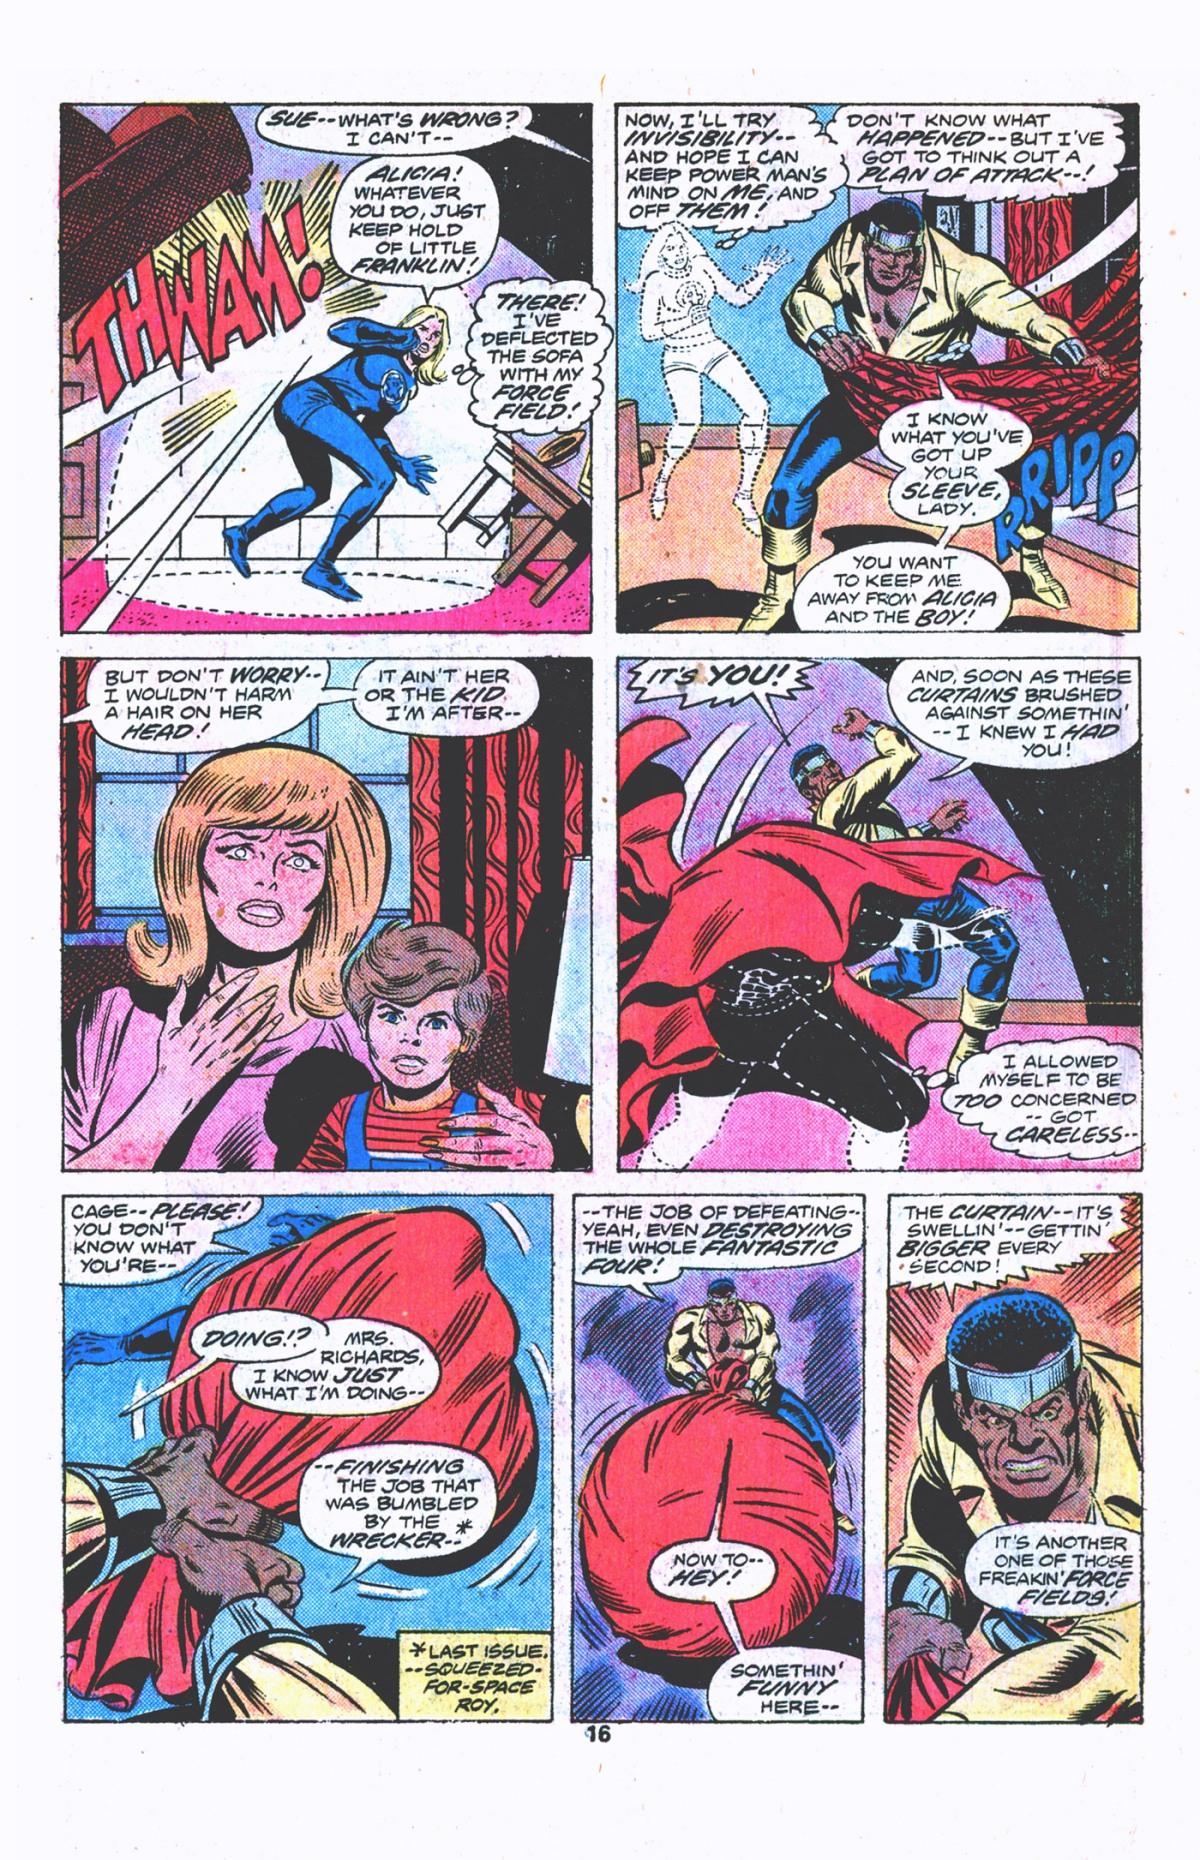 Luke Cage vs. The Fantastic Four